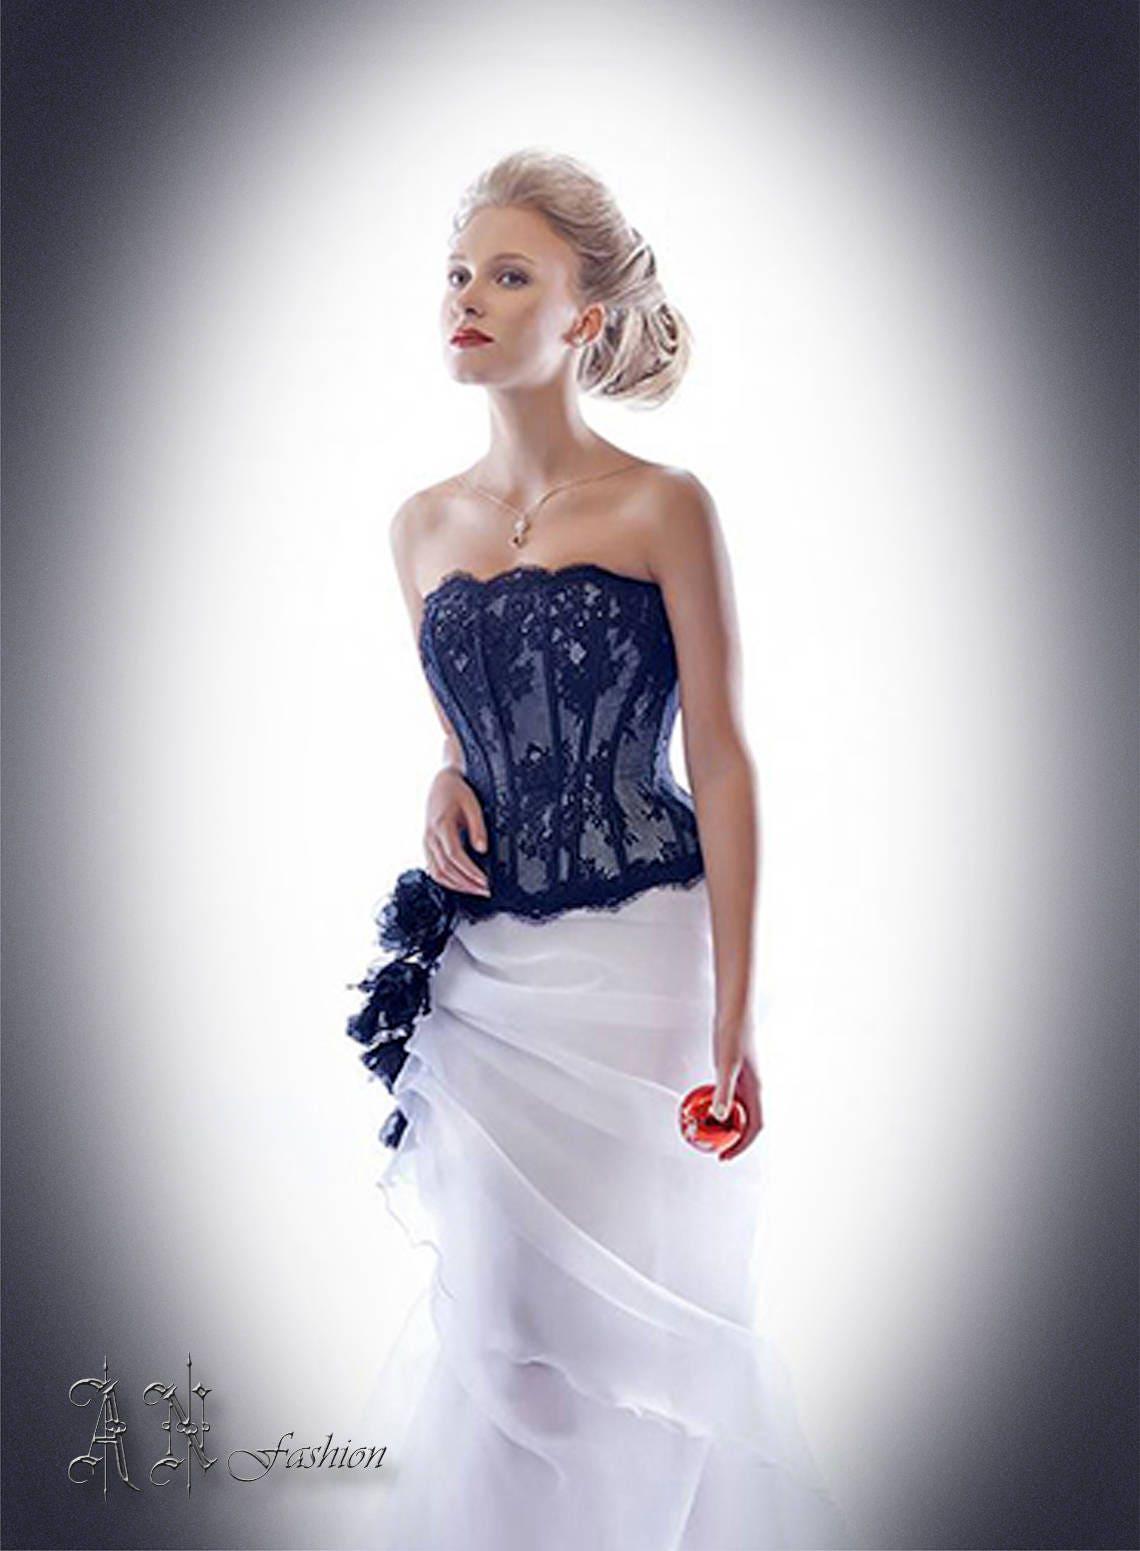 Lace corset strapless wedding corset black wedding top for Lace corset top wedding dress